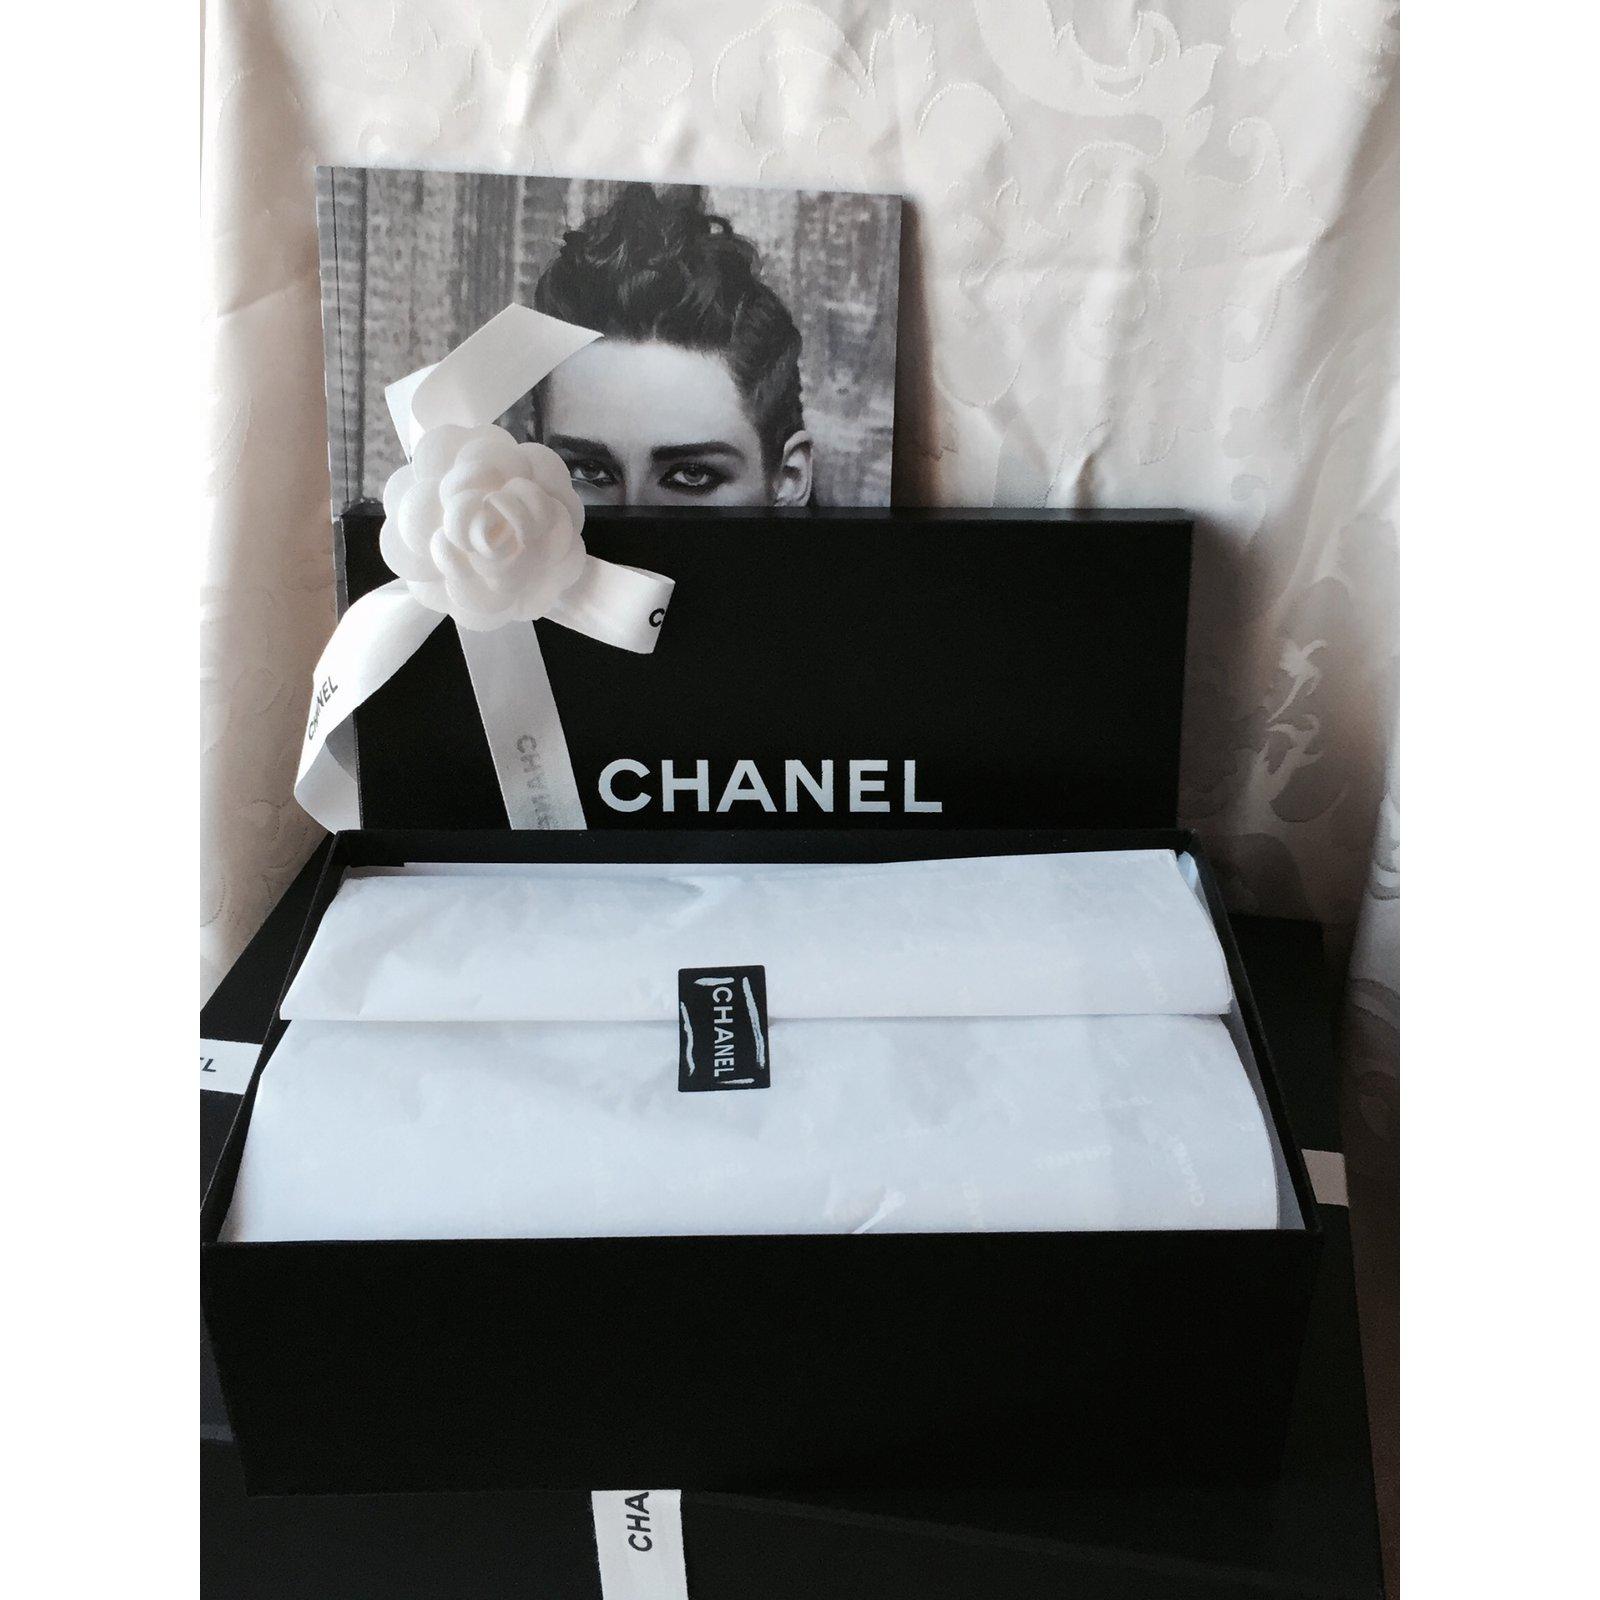 Chanel Sandals Sandals Leather Golden Ref 37566 Joli Closet